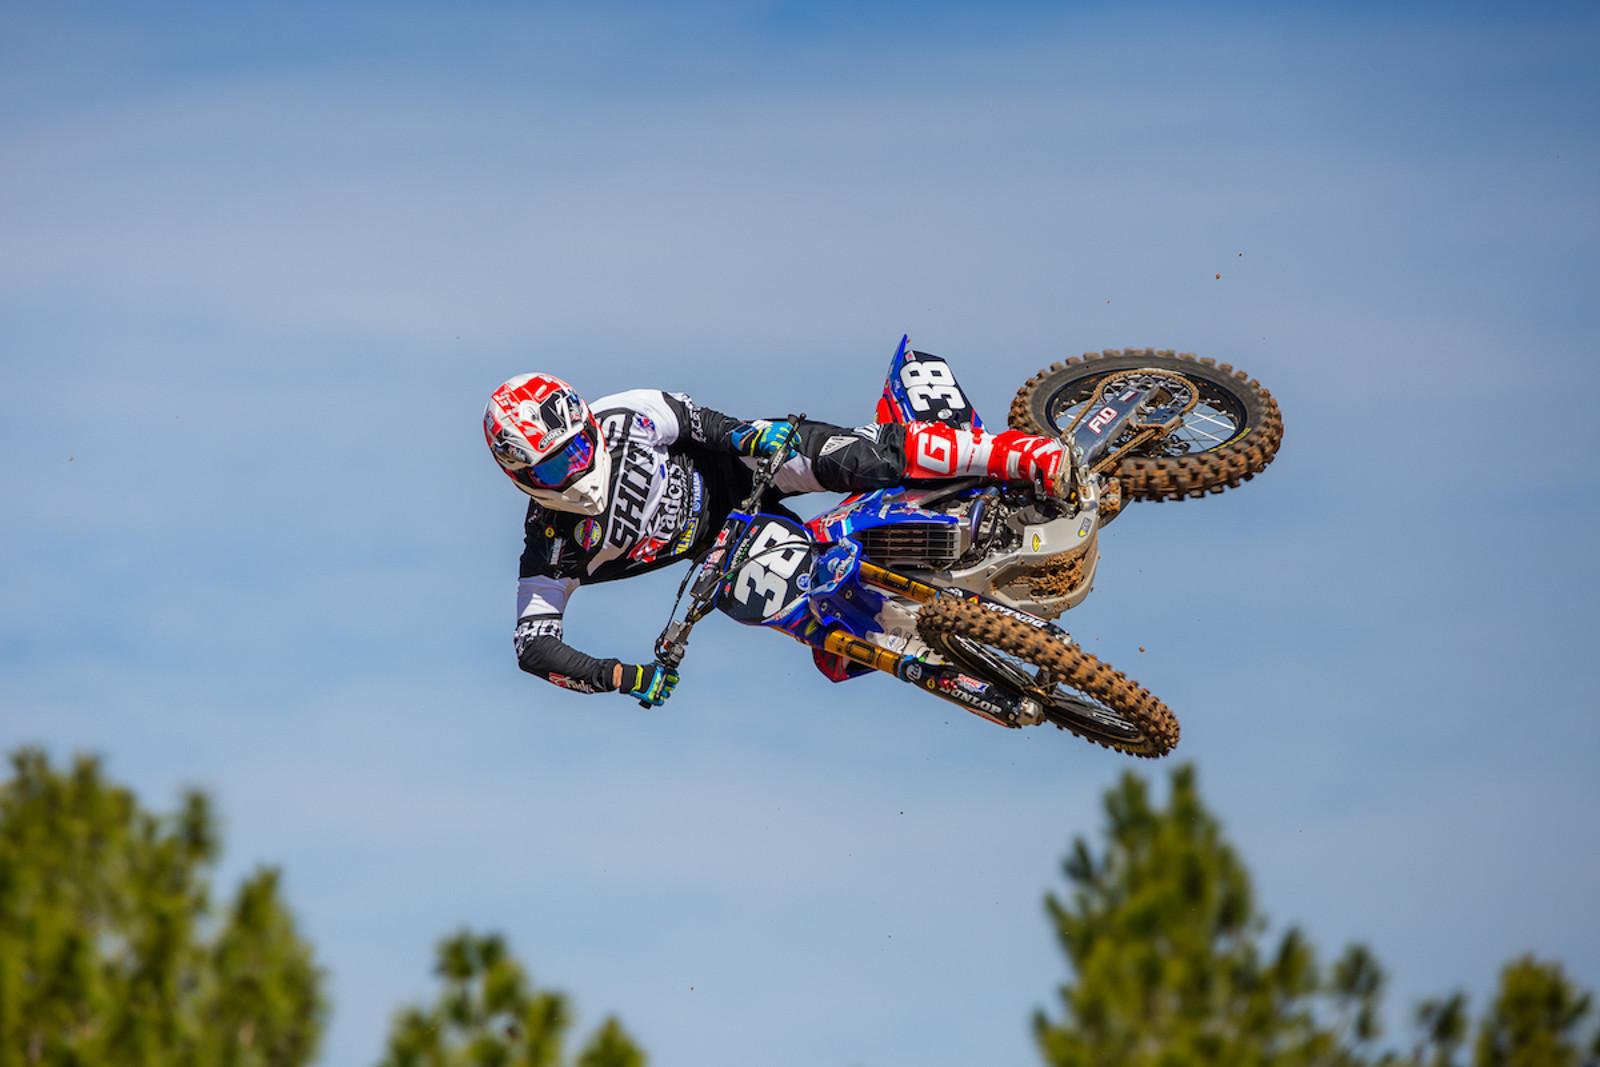 Luke Renzland and Traders Racing Yamaha Part Ways